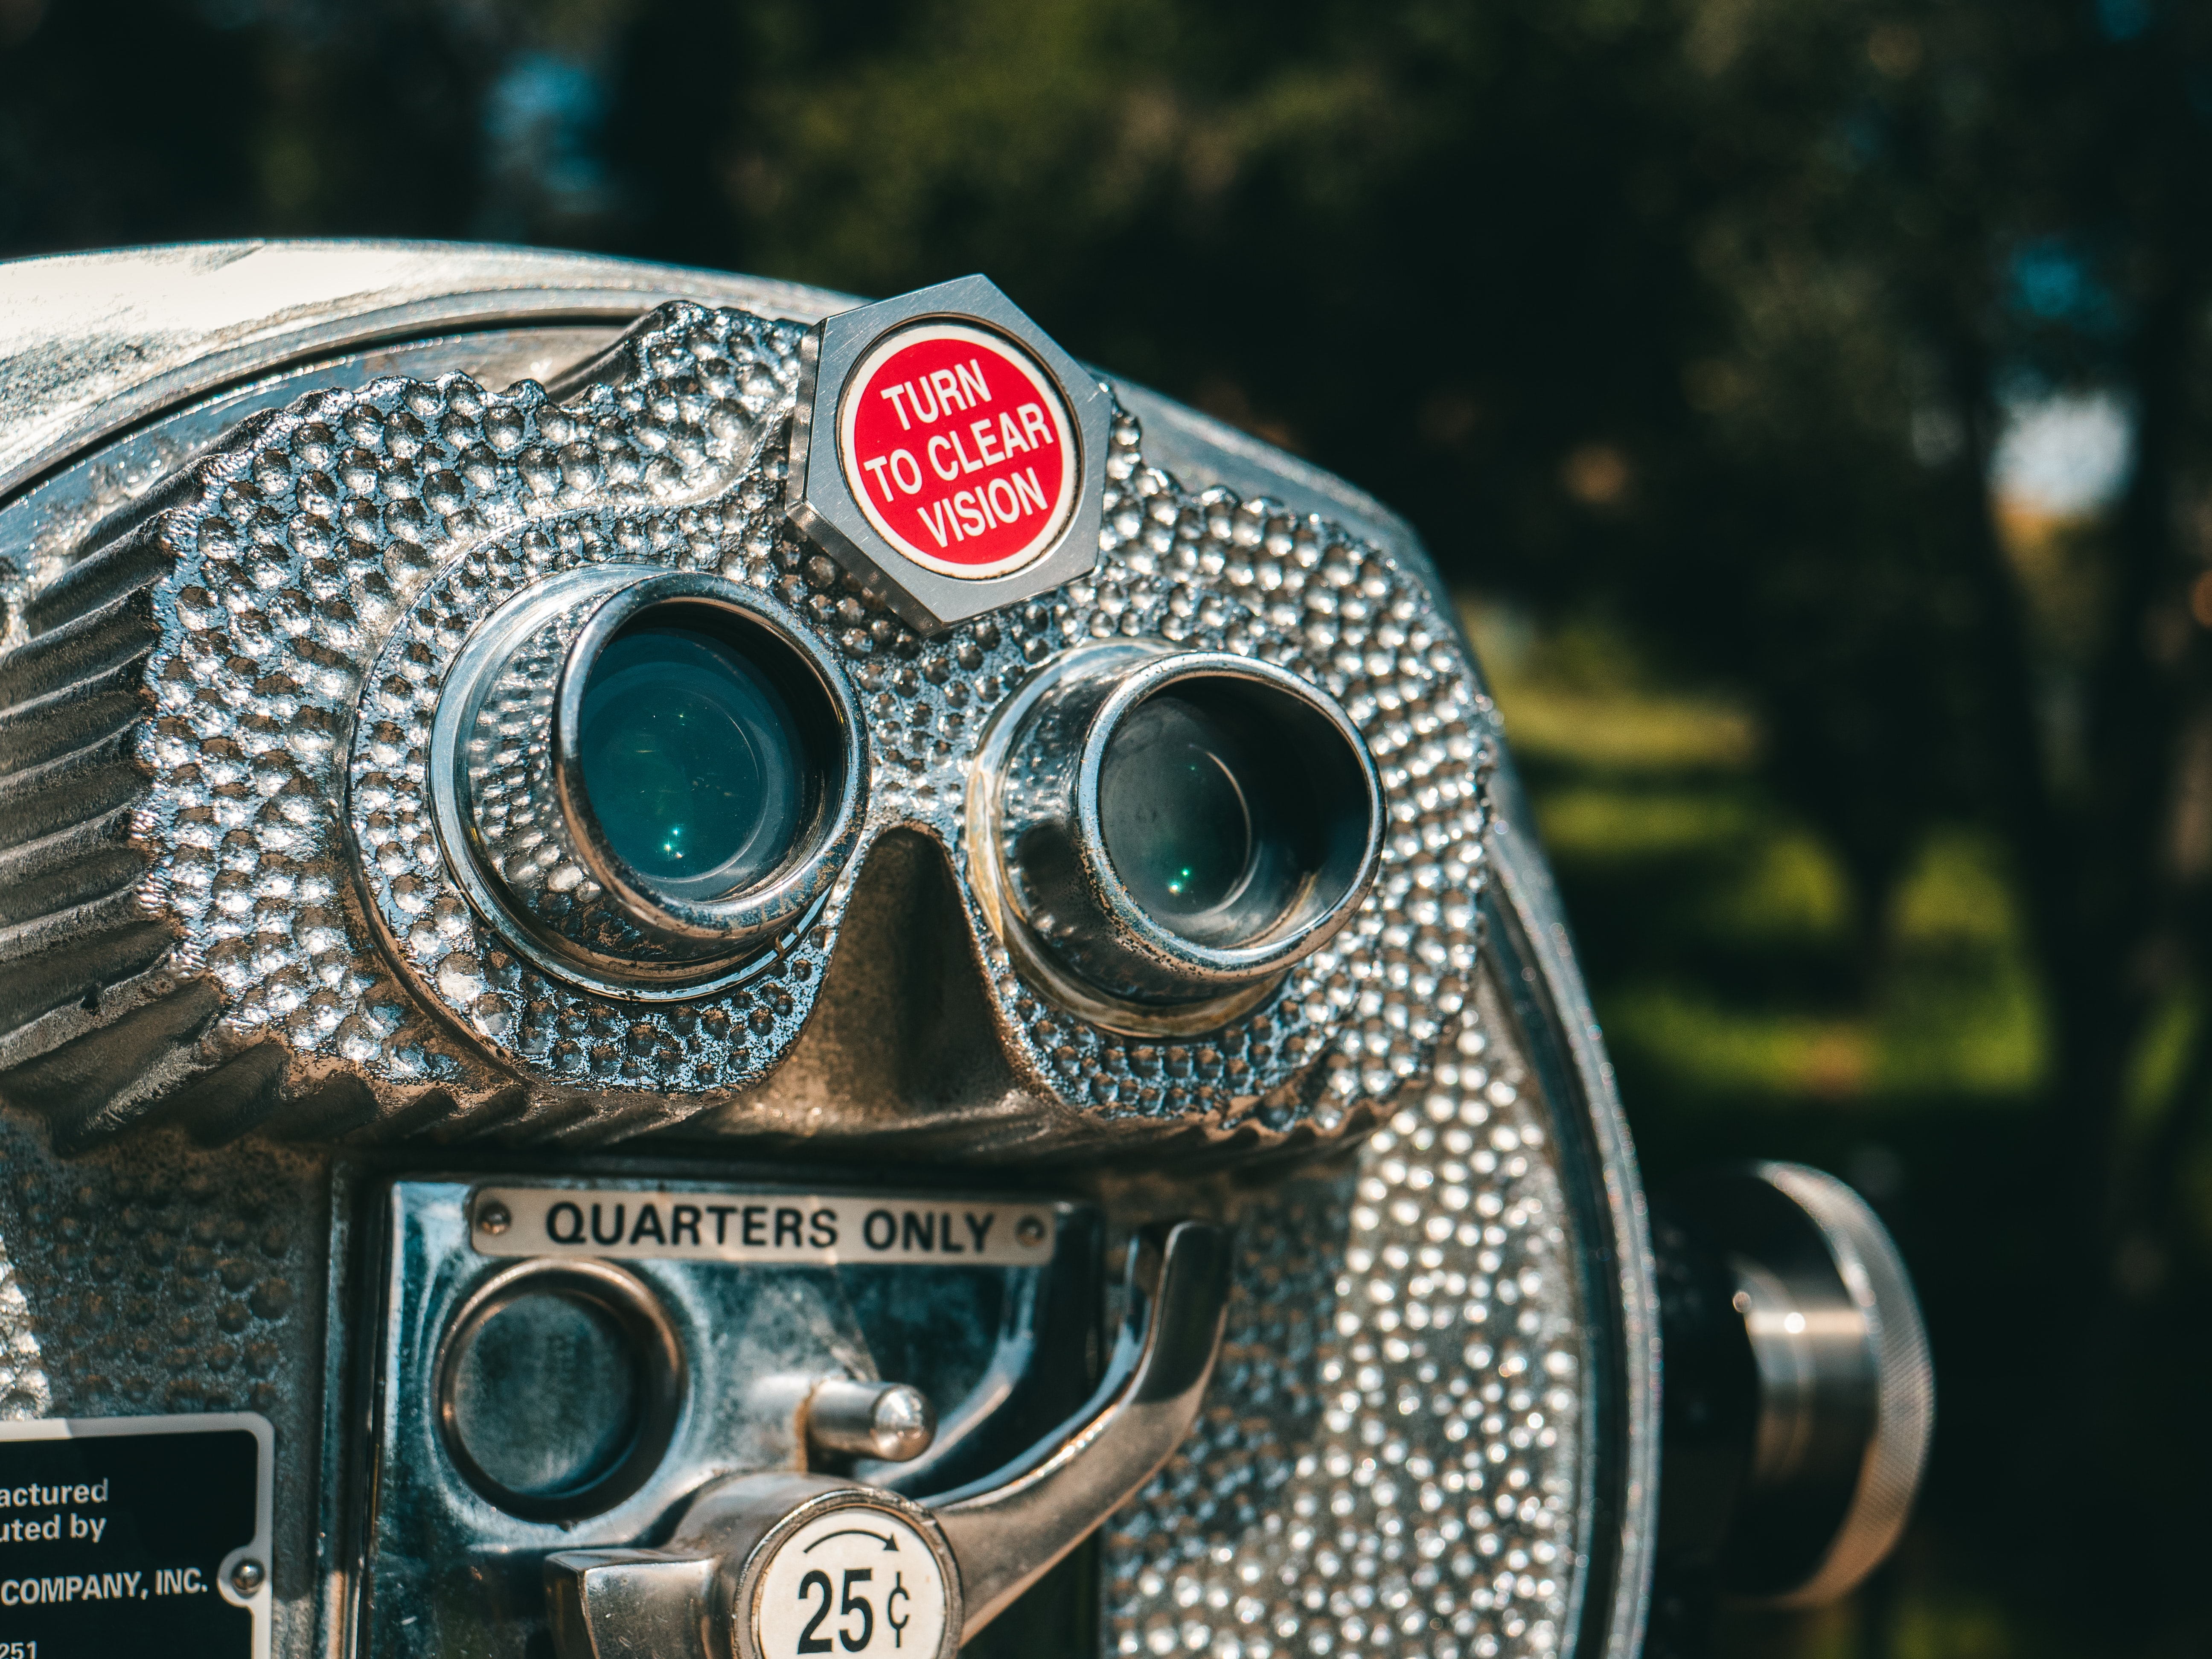 Binoculars Photo by Ronan Furuta on Unsplash